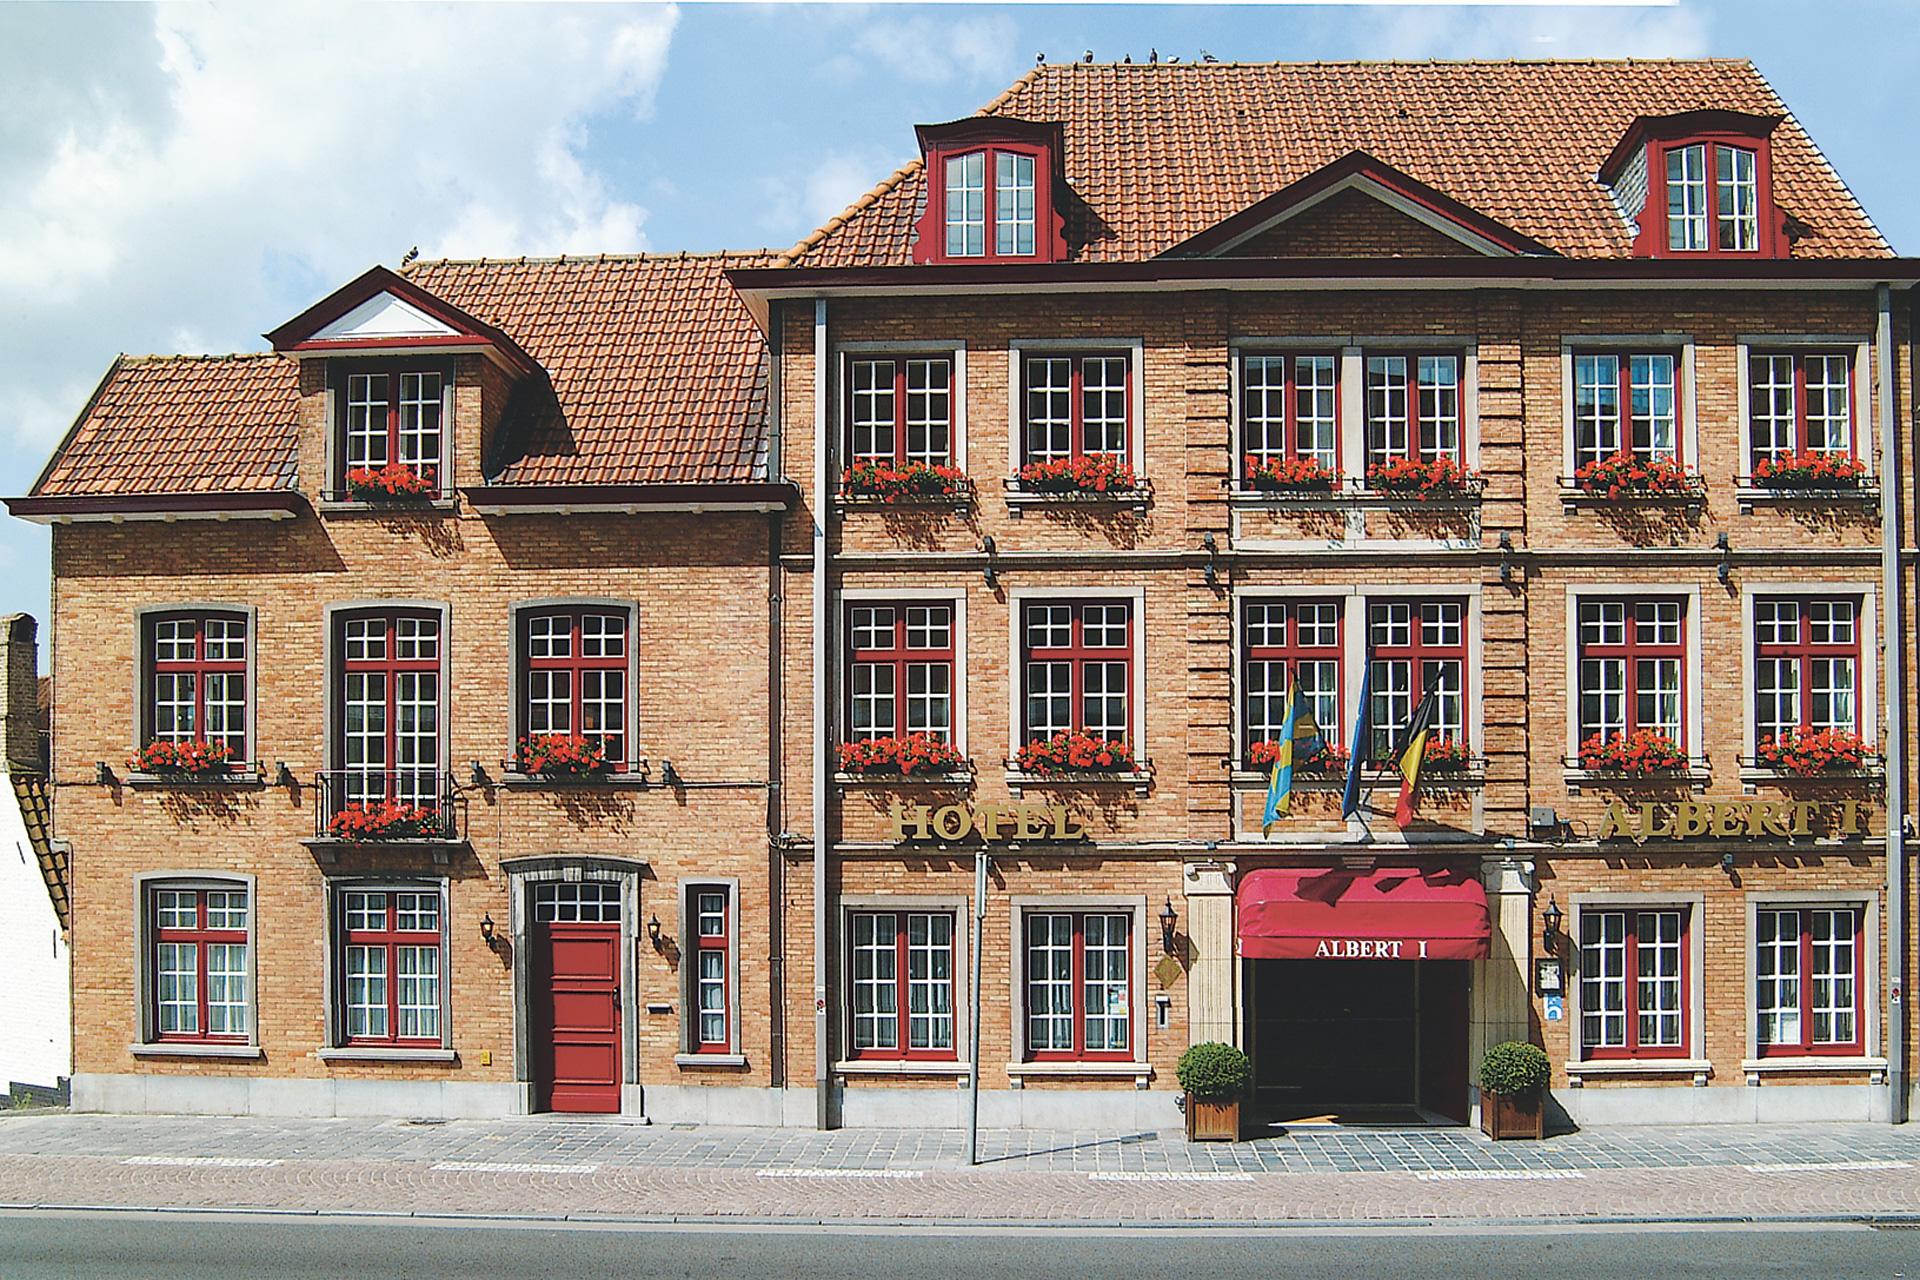 Bilder - Hotel Albert 1